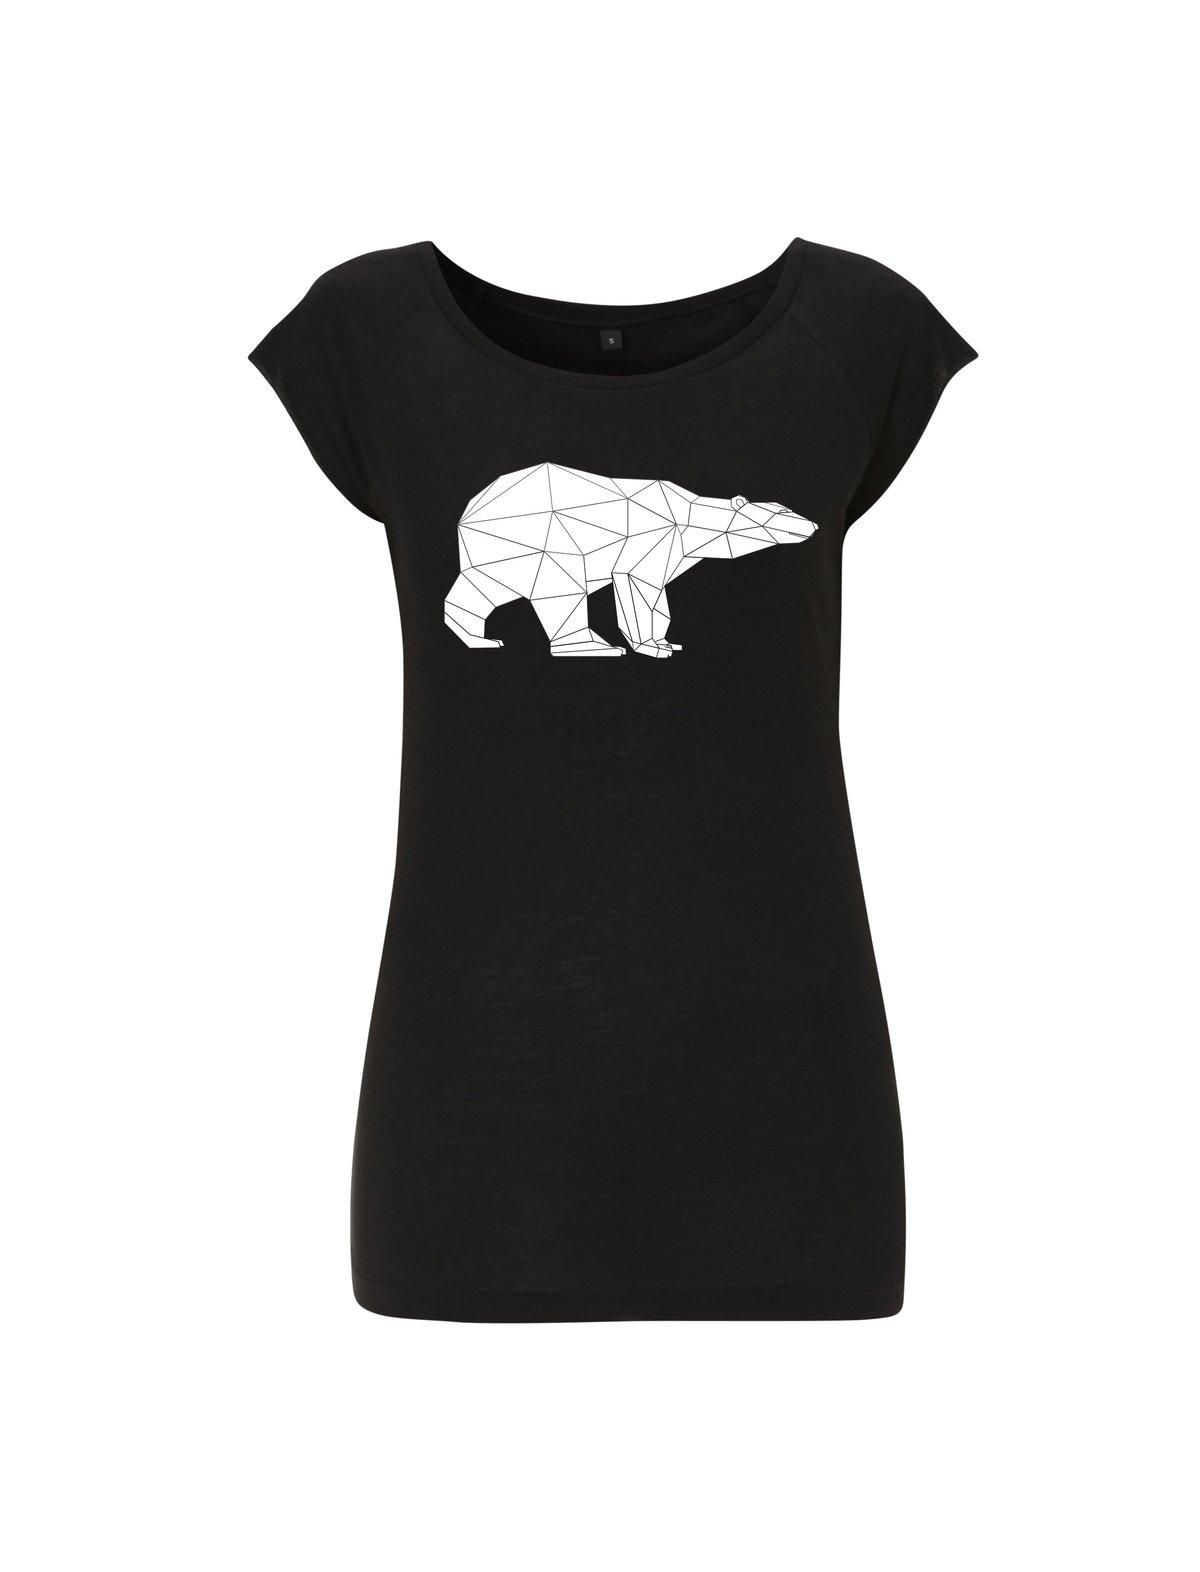 Image of Polar Bear Female